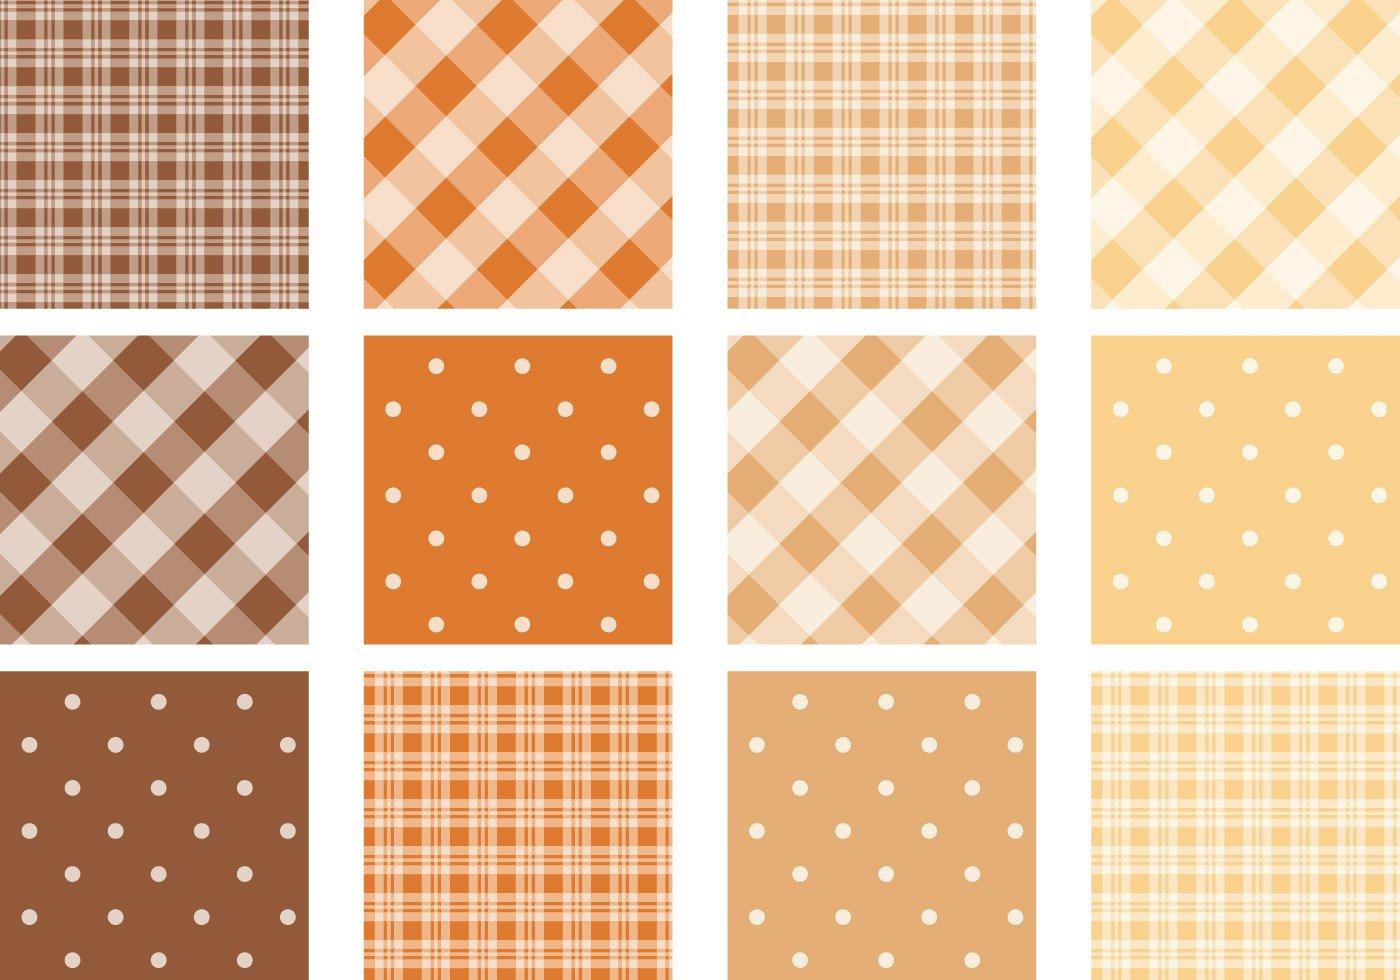 Polka Dot Brush Photoshop Fall Colored Plaid and Polka Dot Pattern Pack Free